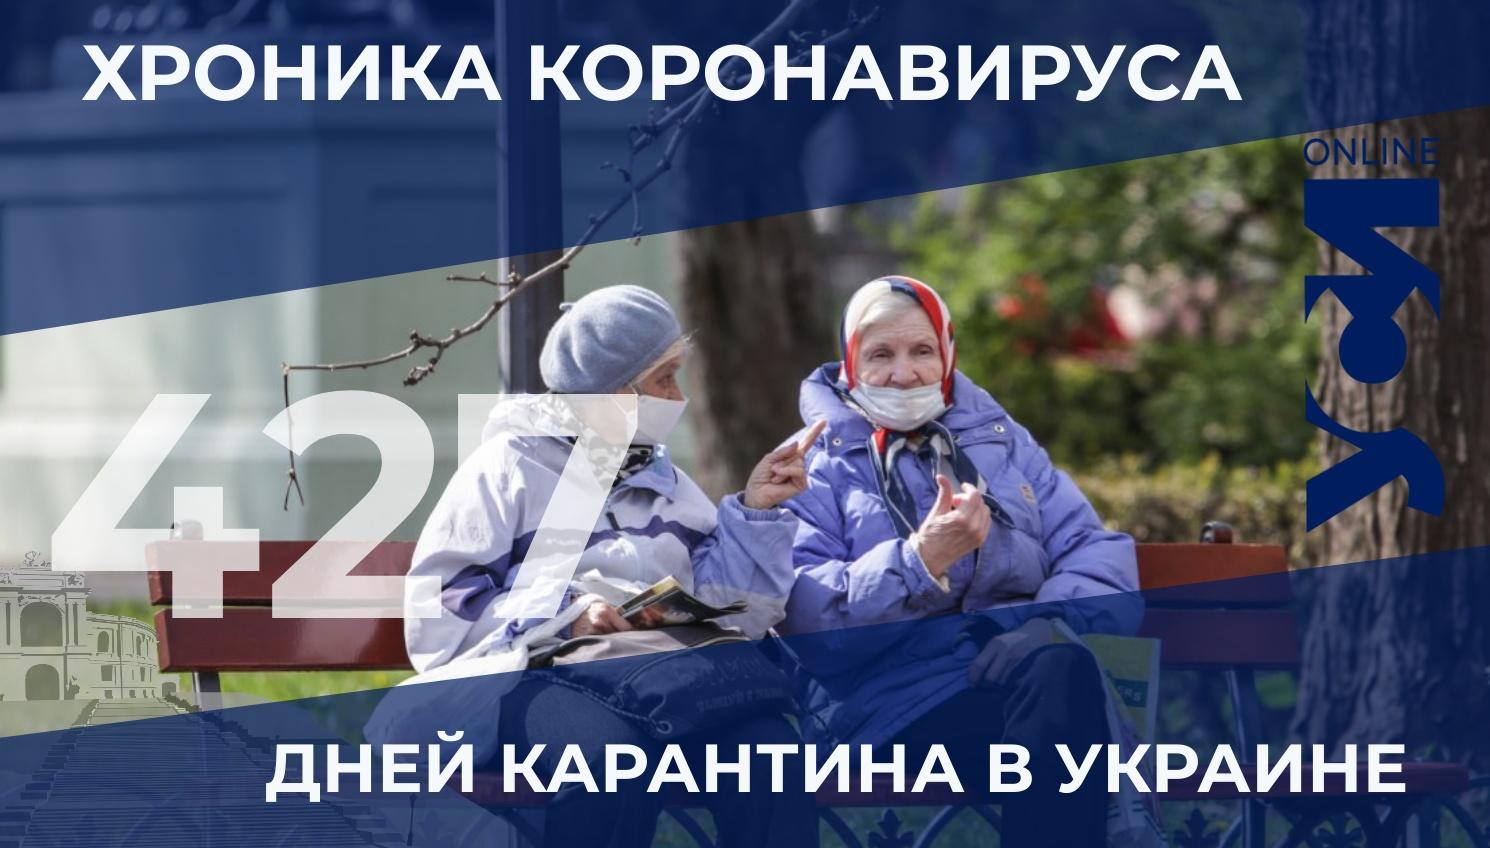 Хроника коронавируса: в Одесской области — спад уровня заболеваемости «фото»